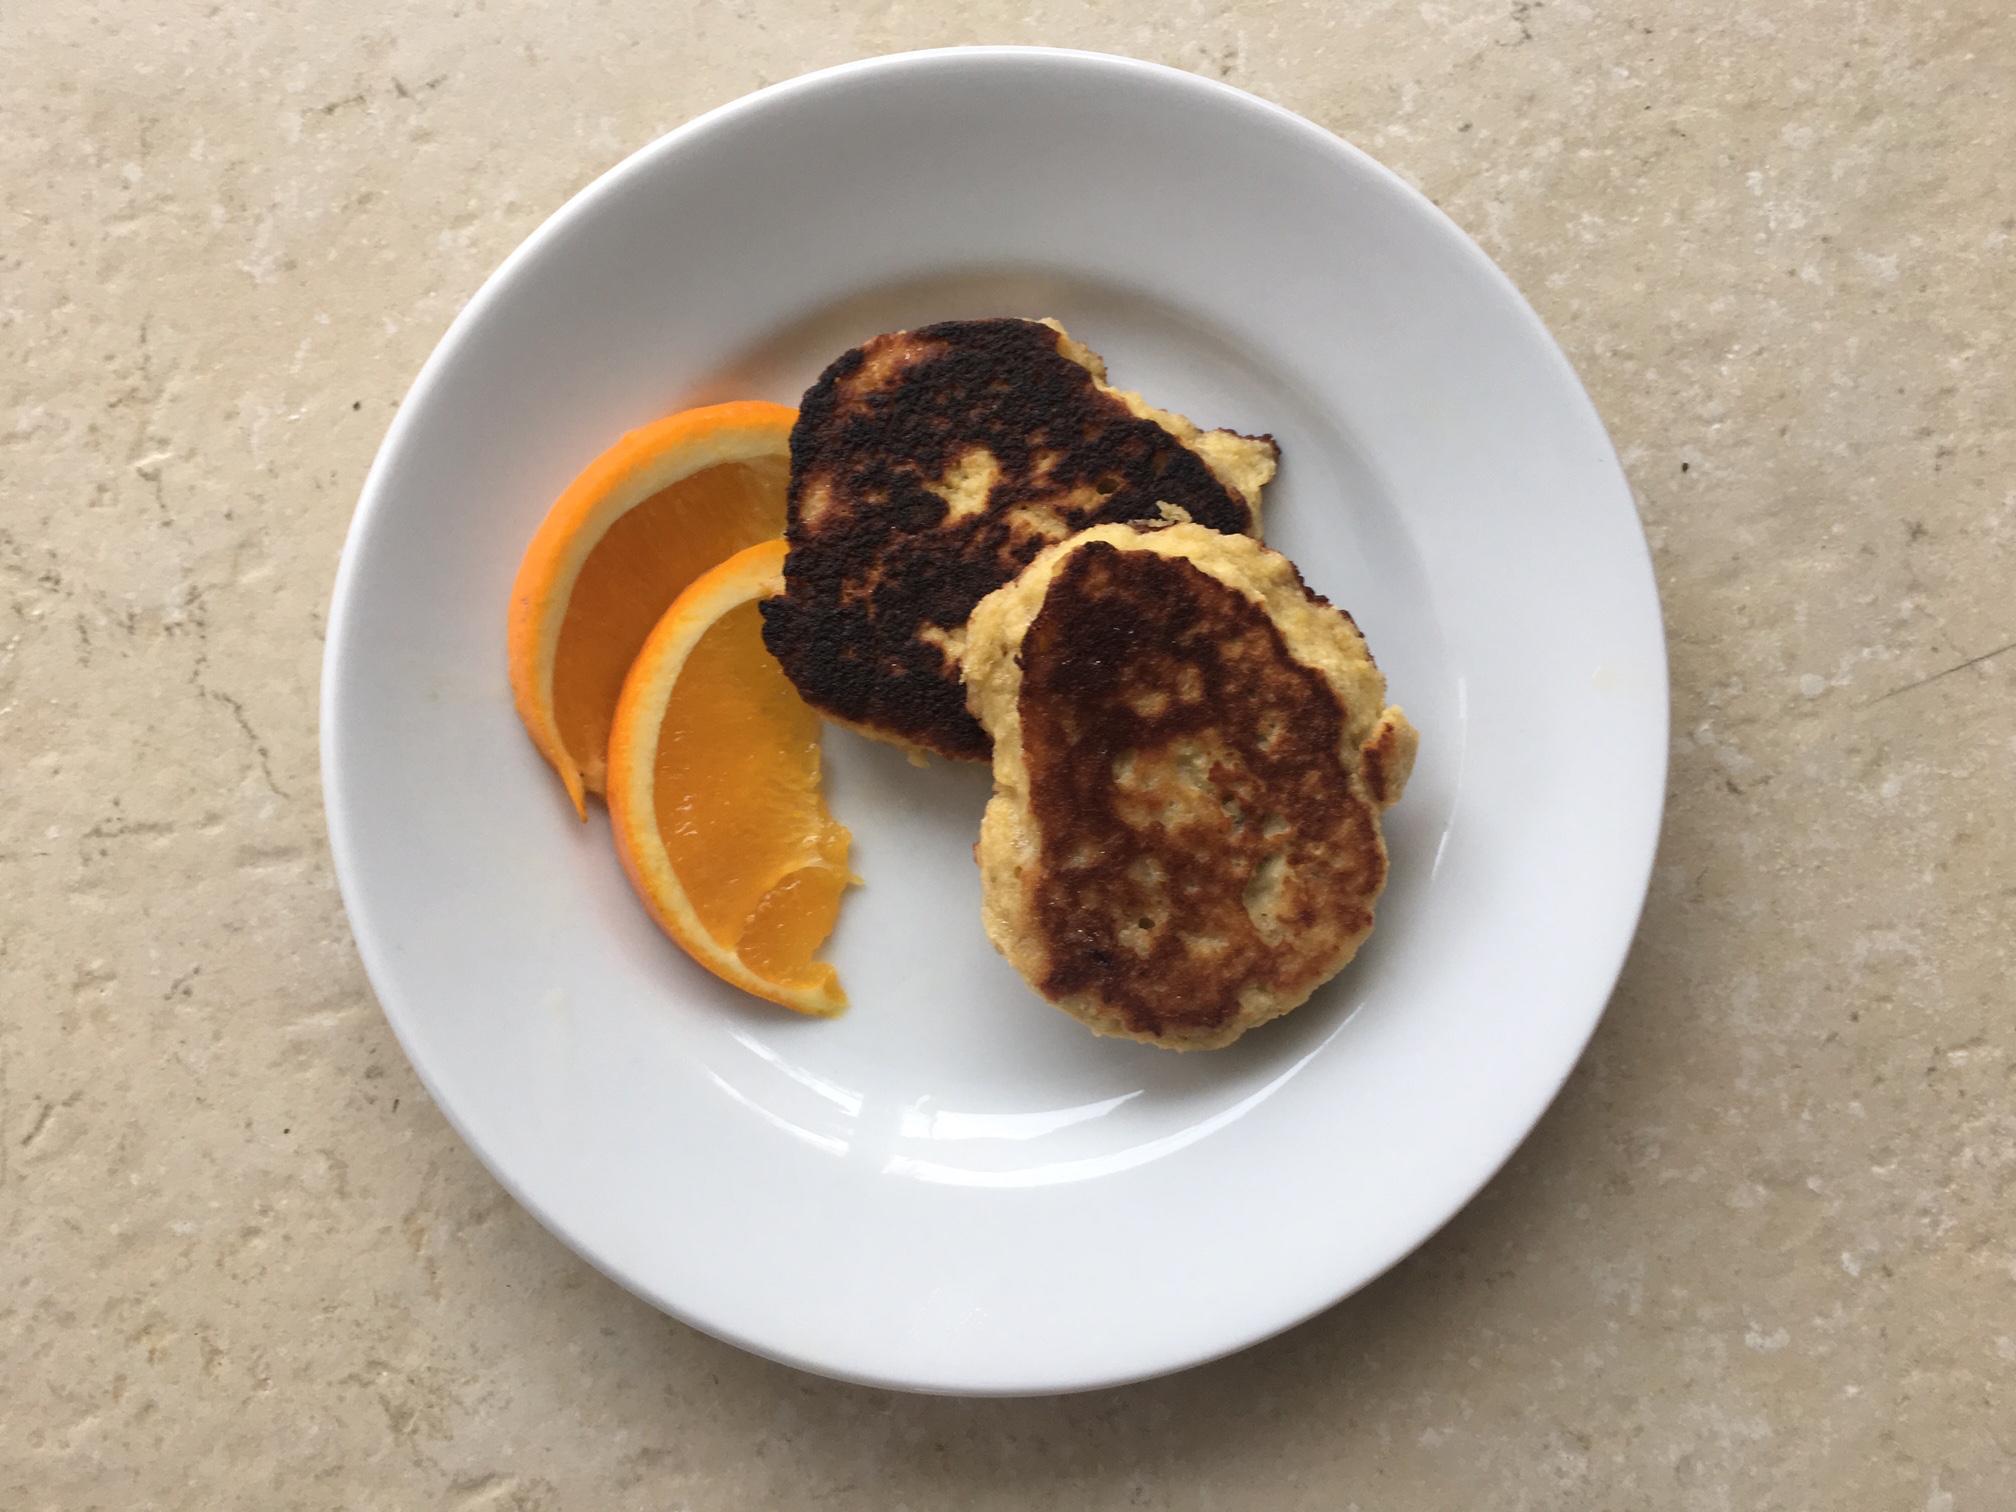 Kokos - Banana - Pancake - Steinzeit Ernährung - Healthy Food Inspiration